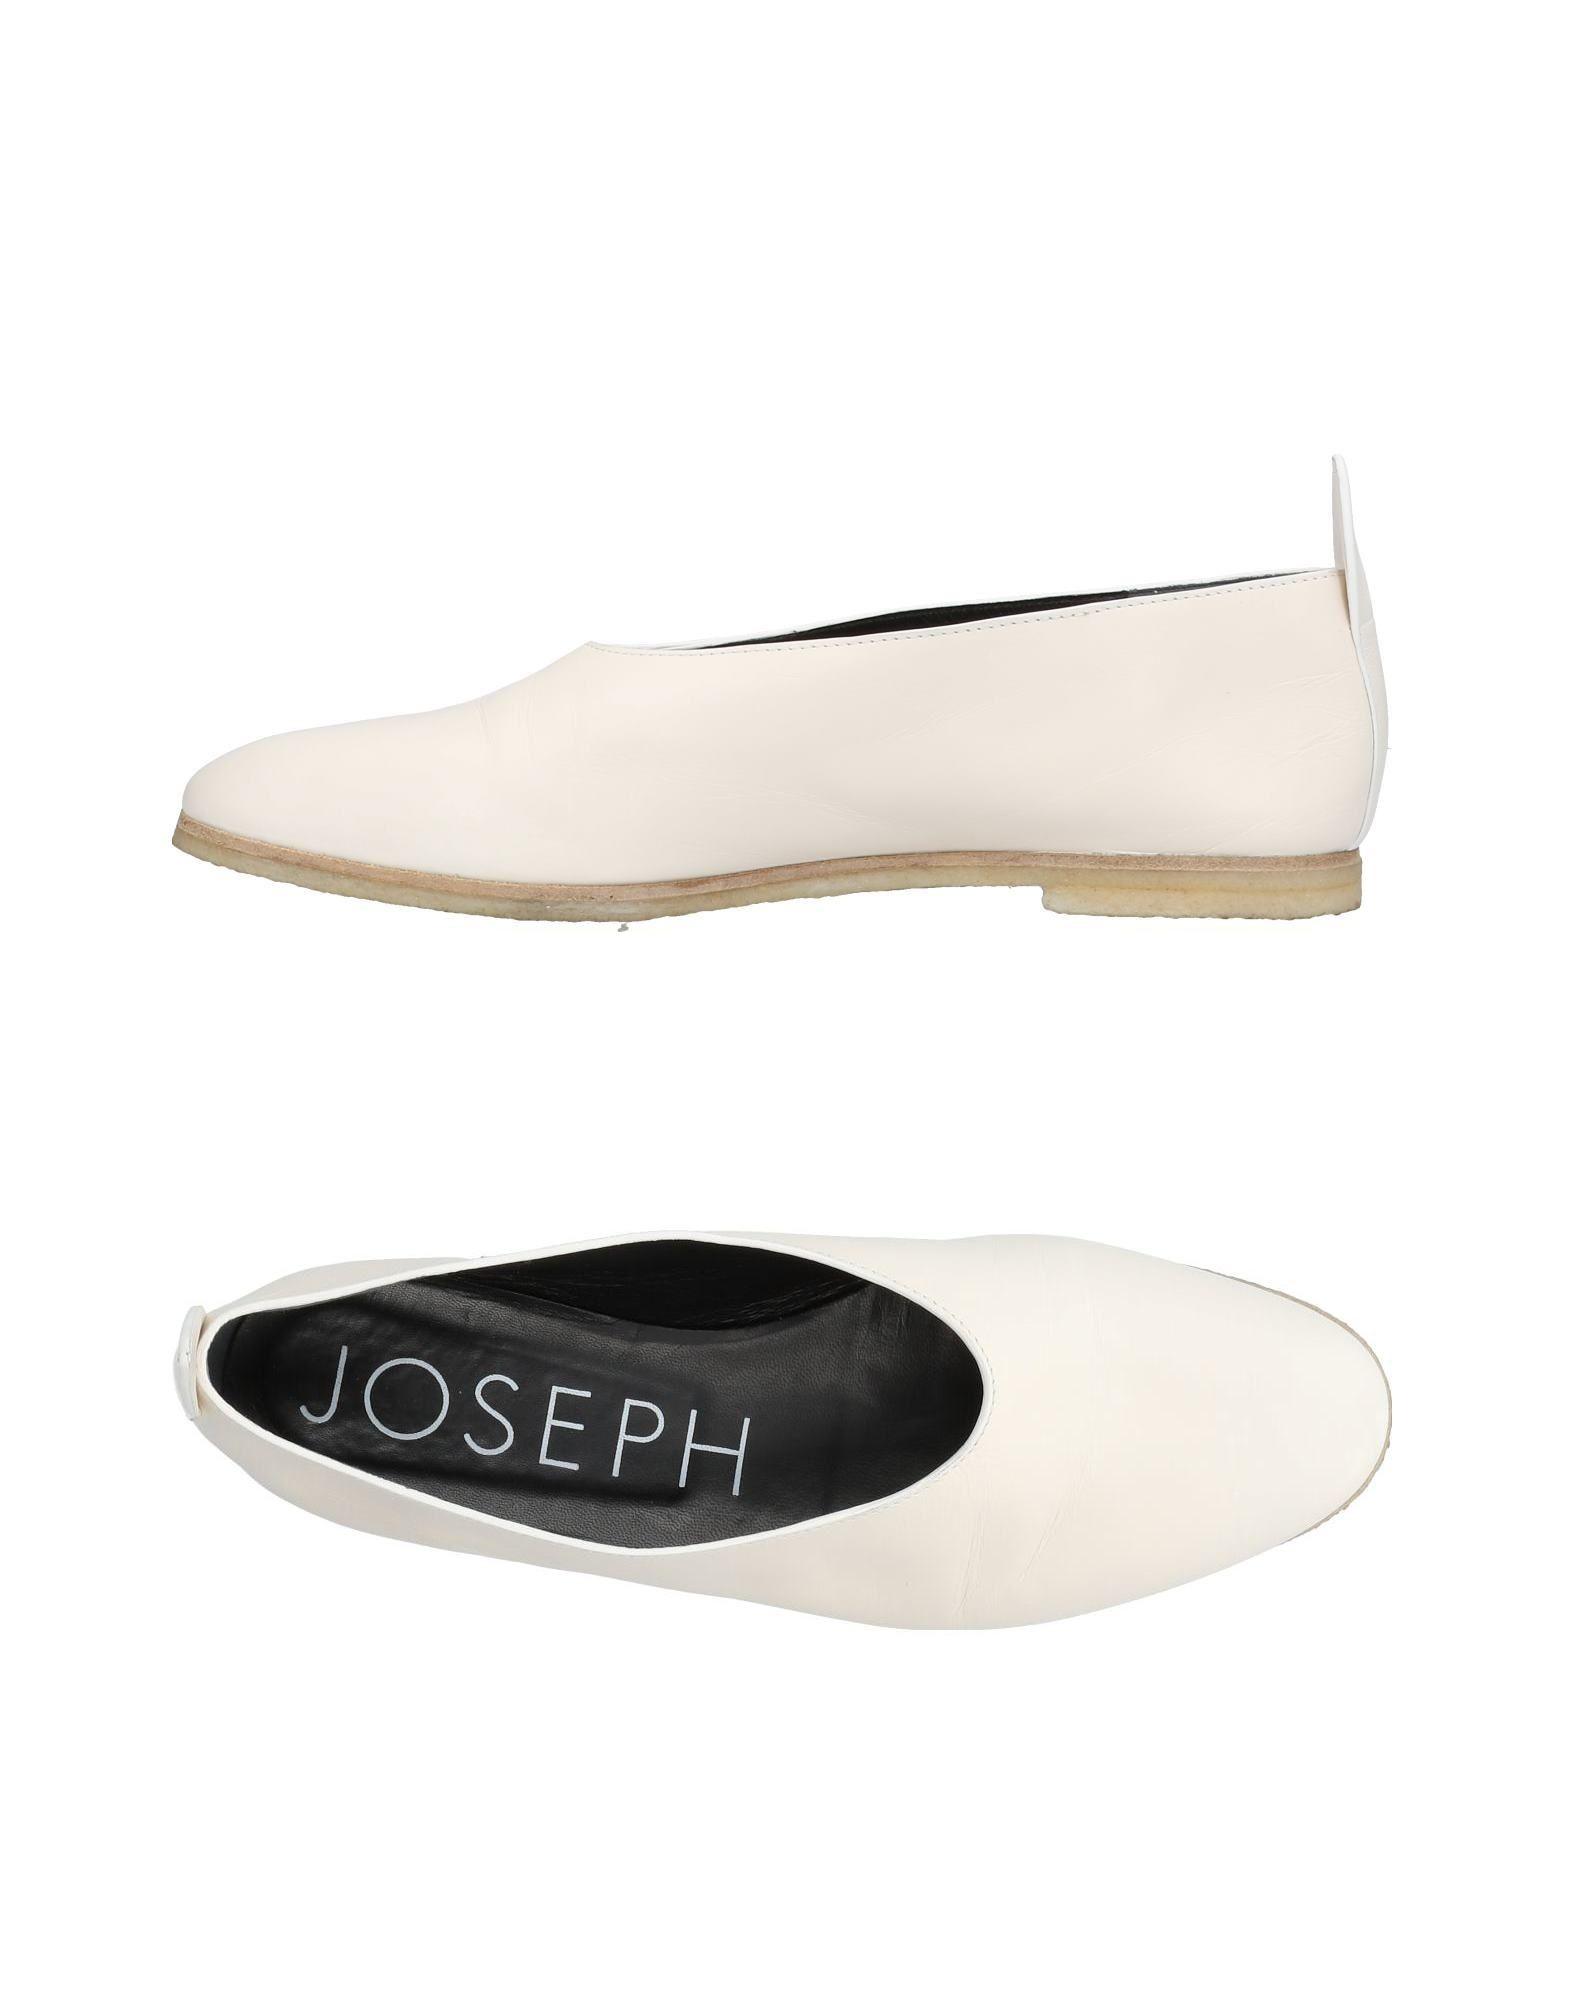 Haltbare Mode billige Schuhe Joseph Ballerinas Damen  11425482FJ Heiße Schuhe